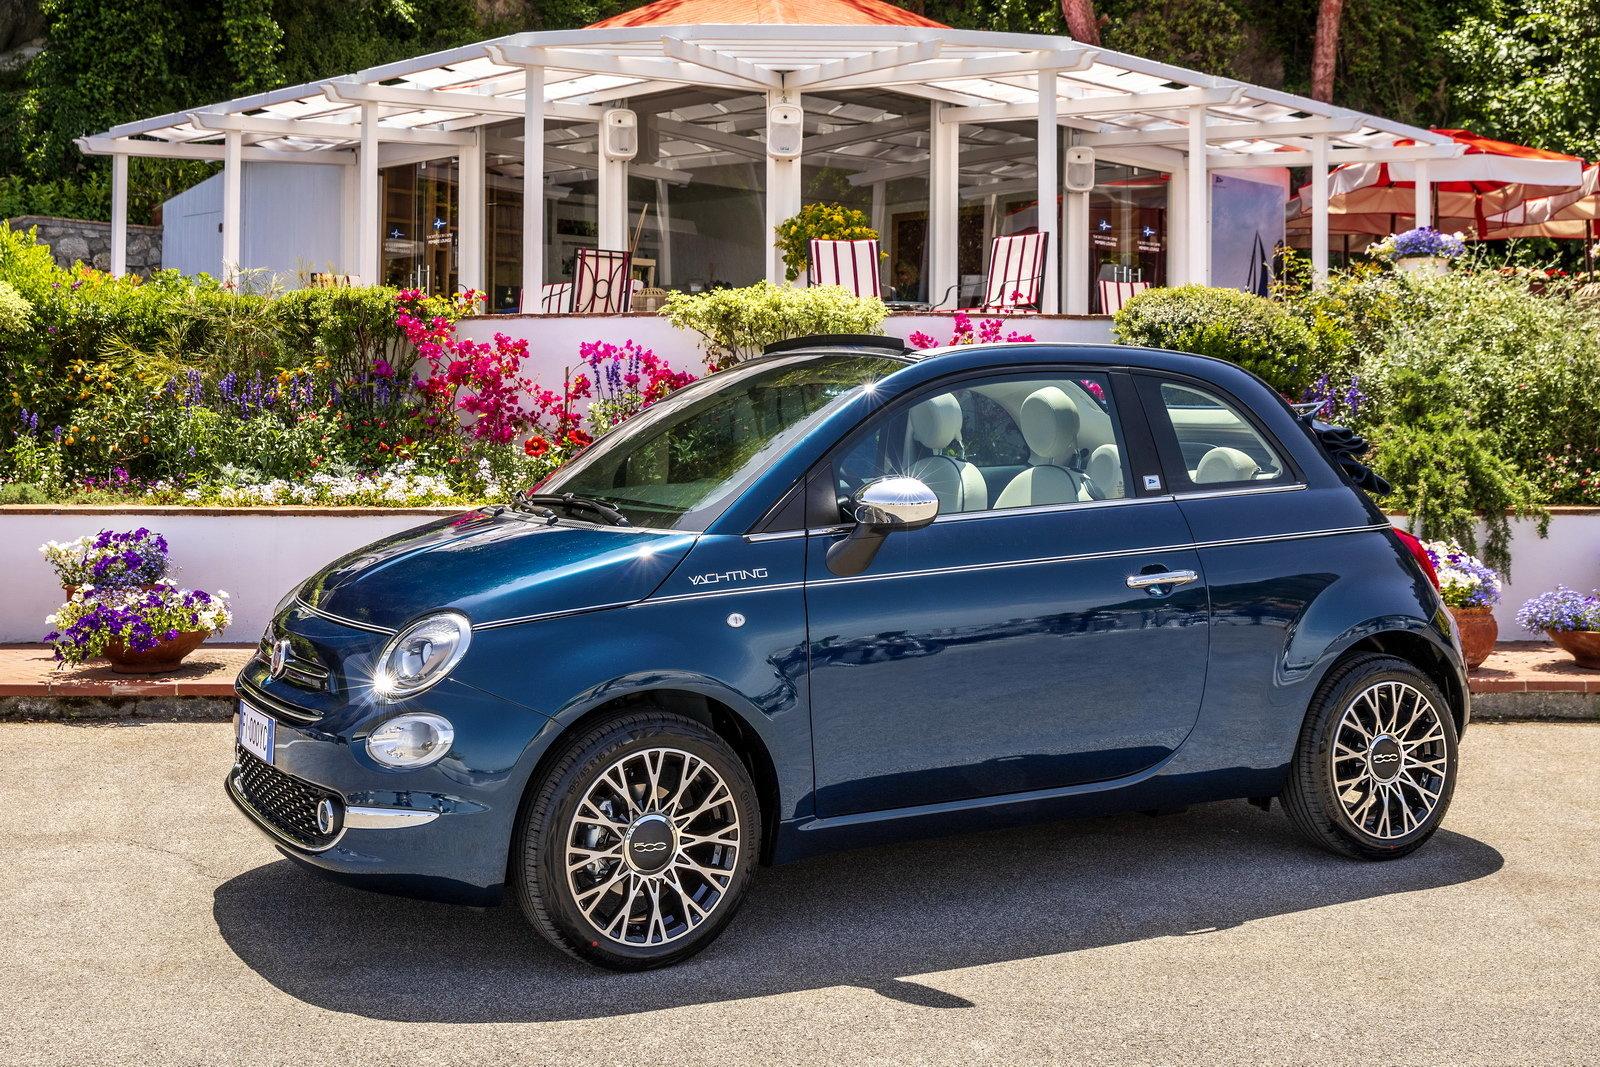 Fiat 500 yacting